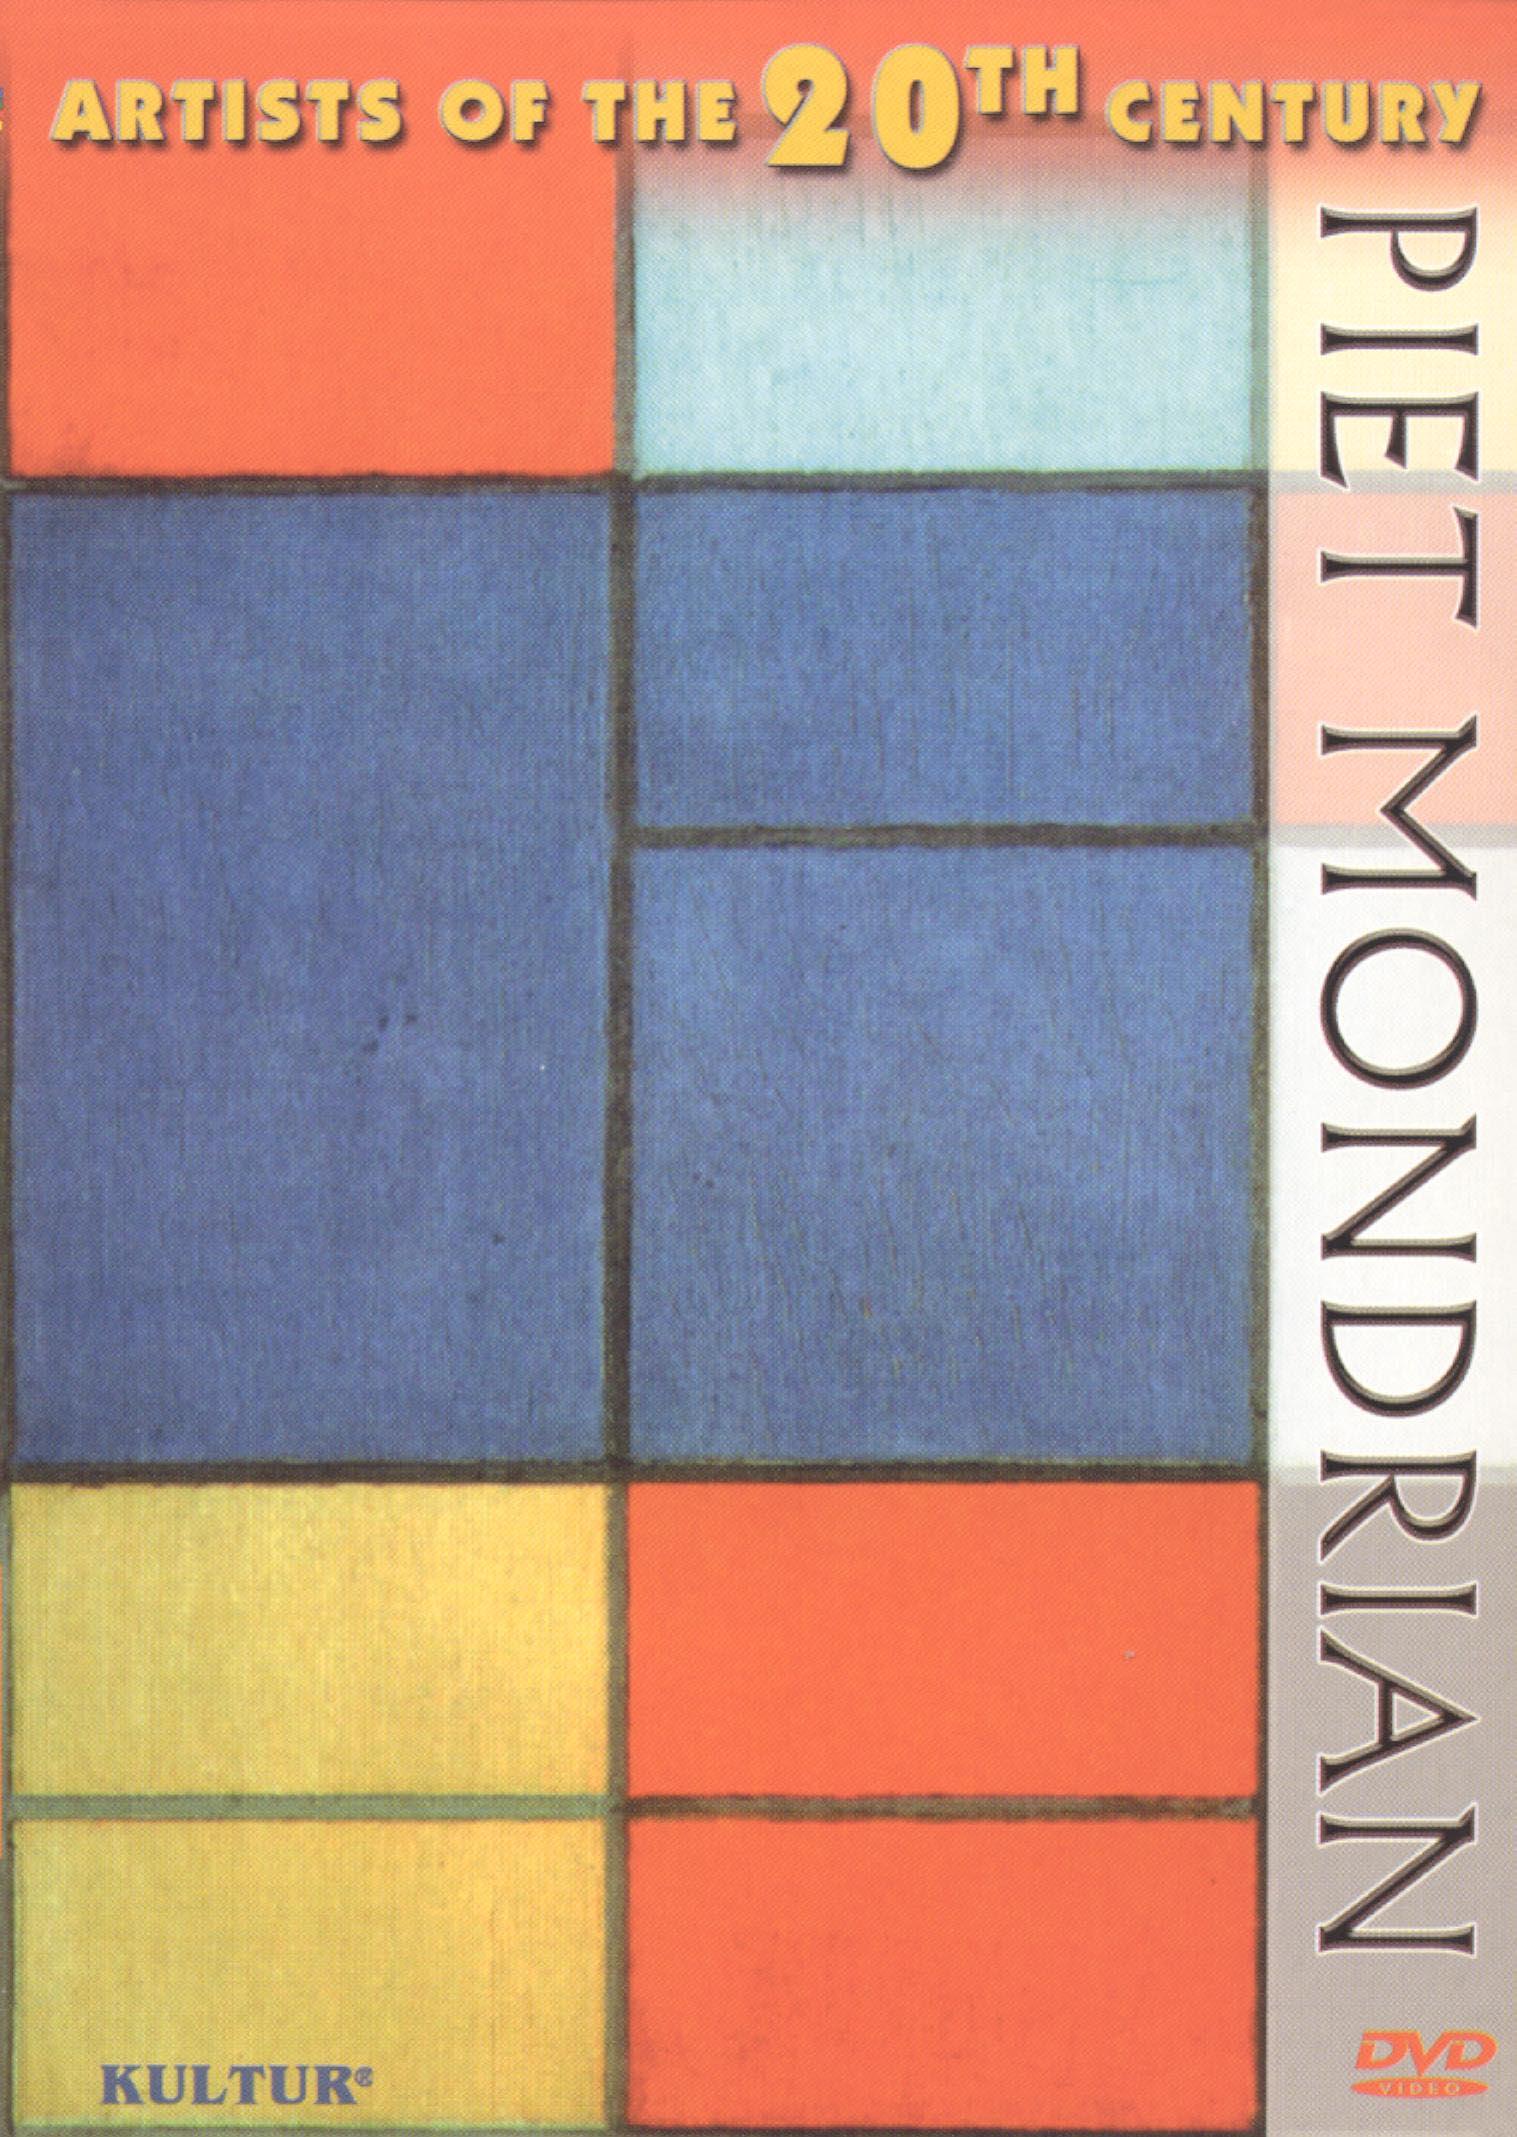 Artists of the 20th Century: Piet Mondrian